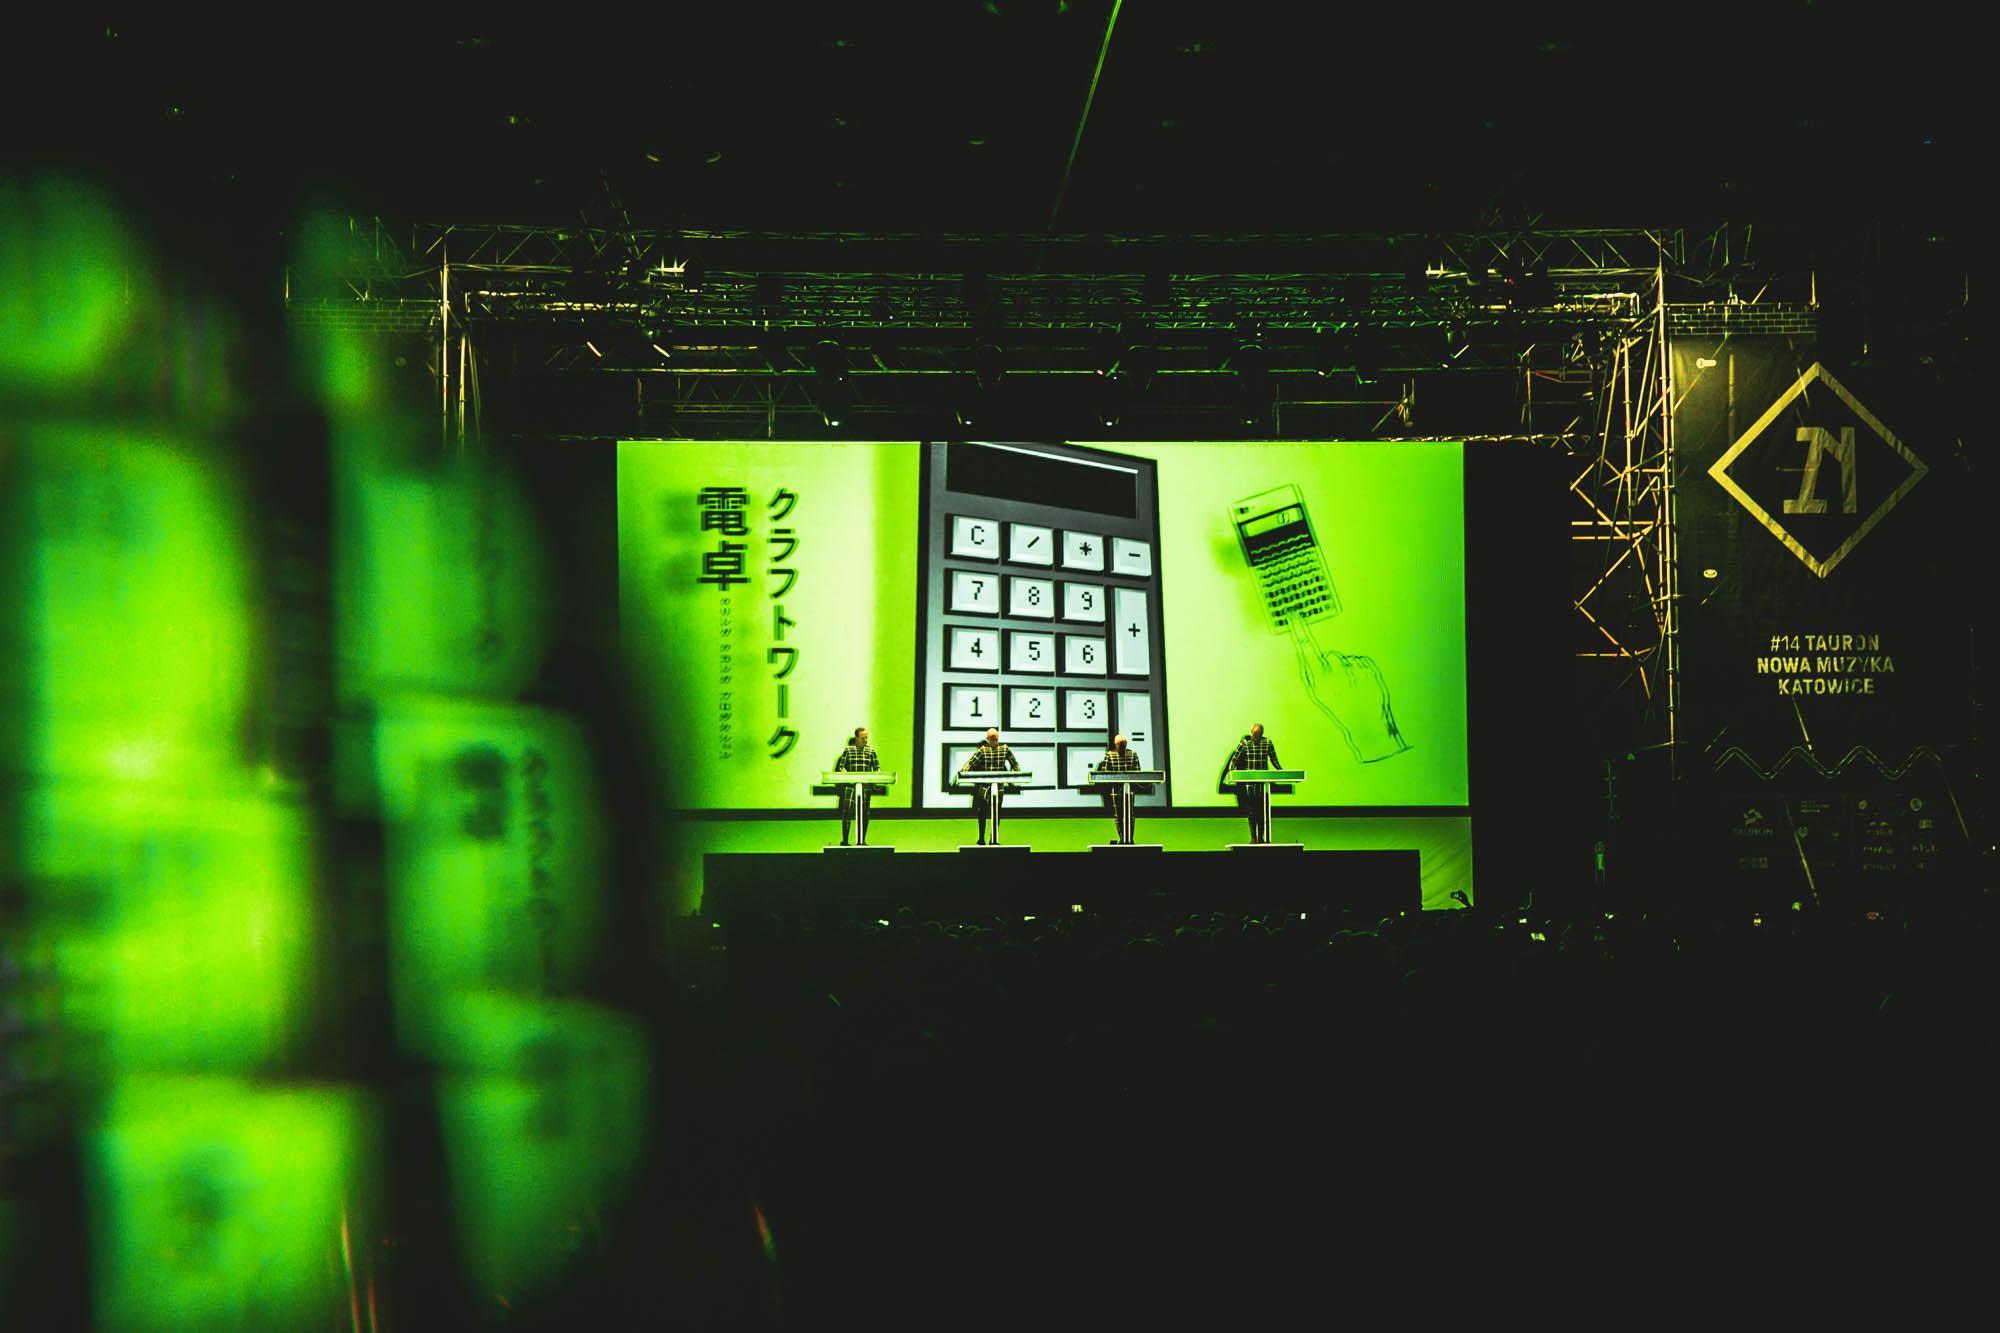 Kraftwerk - Tauron Nowa Muzyka